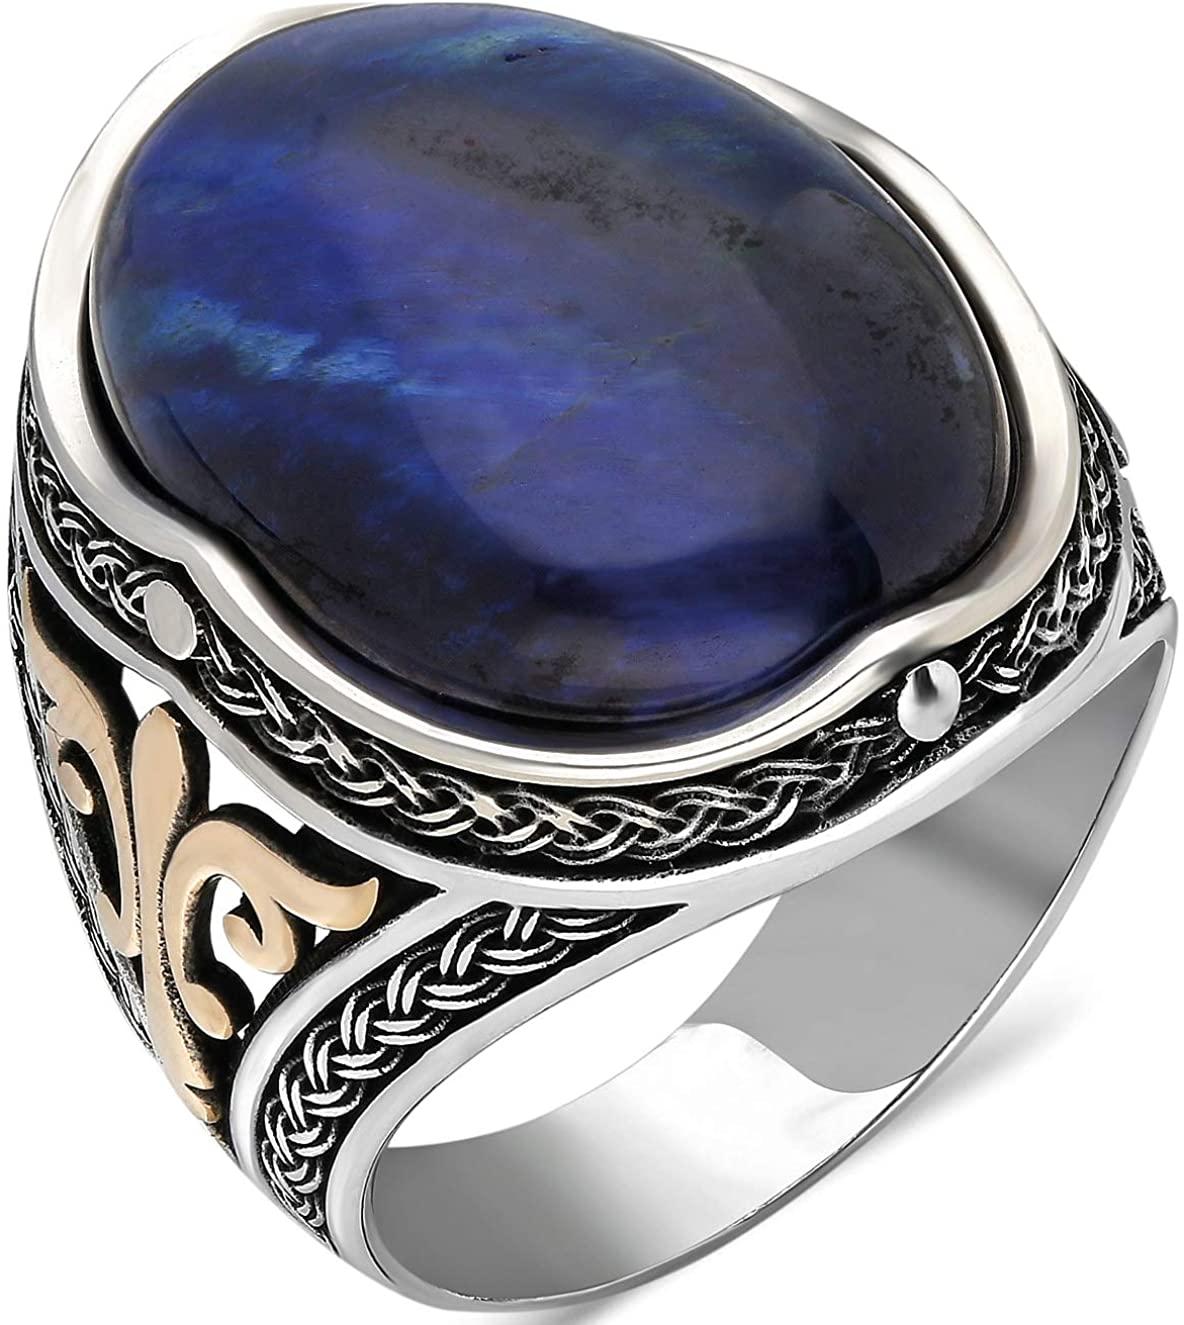 mysilverworld Solid 925 Sterling Silver Oval Blue Tiger's Eye Stone Men's Ring